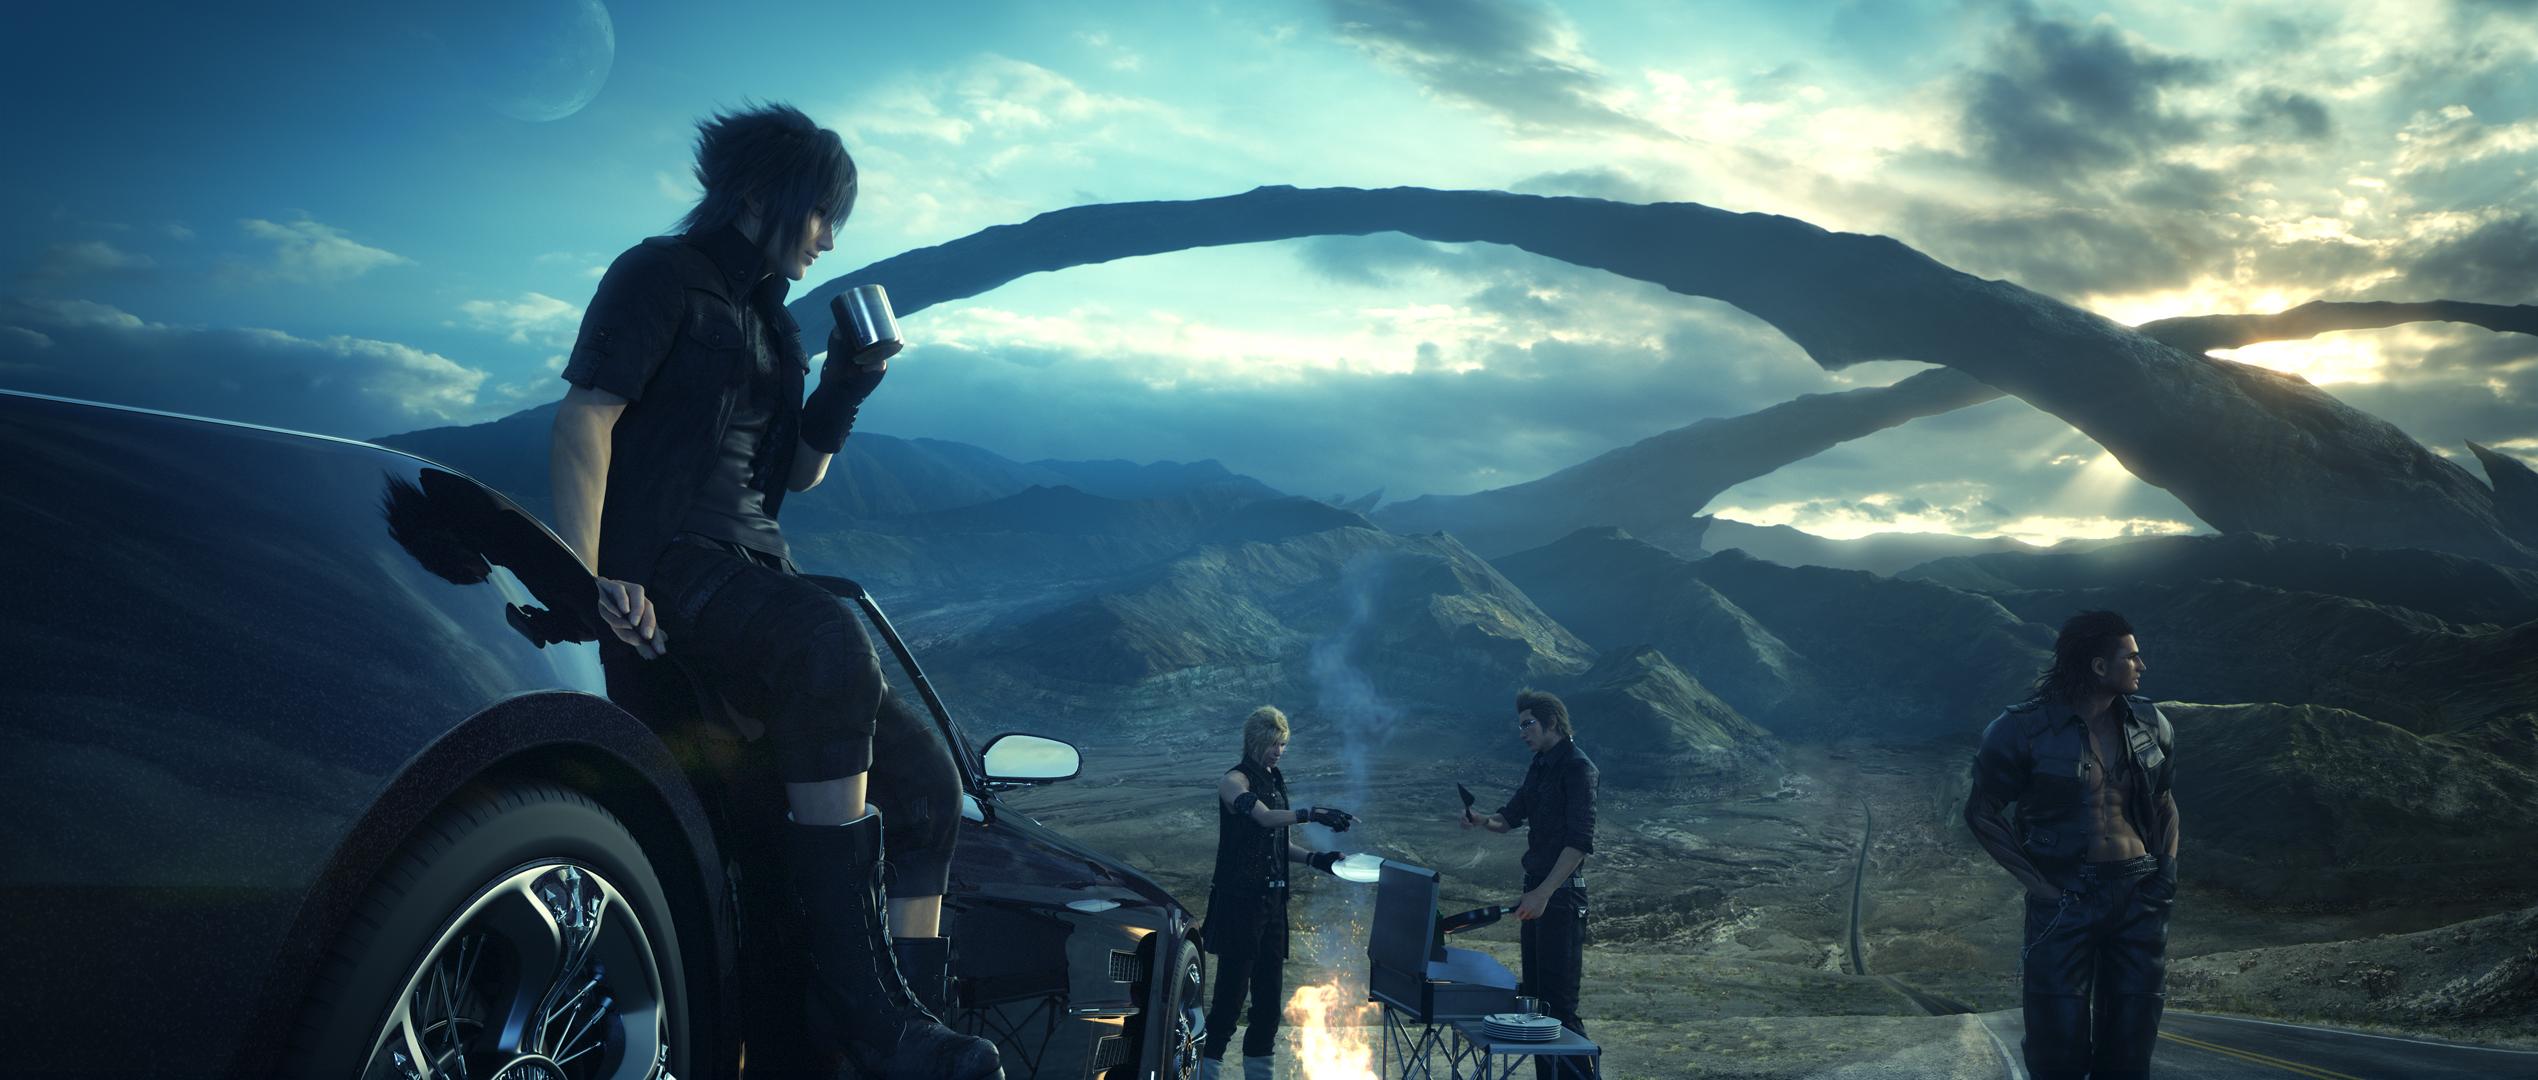 Final-fantasy-xv Landscape